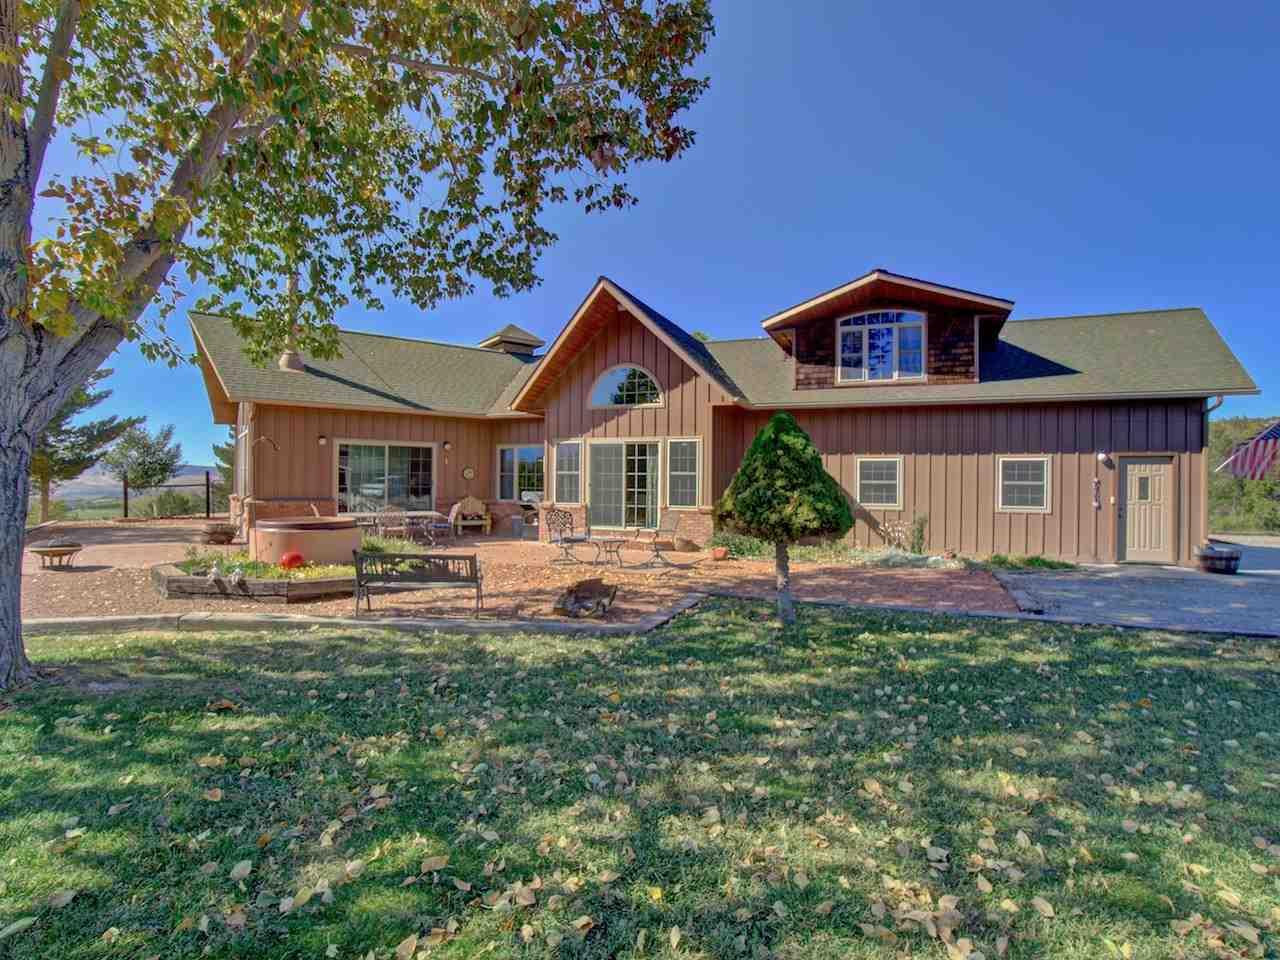 34816 Powell Mesa Road, Hotchkiss, CO 81419